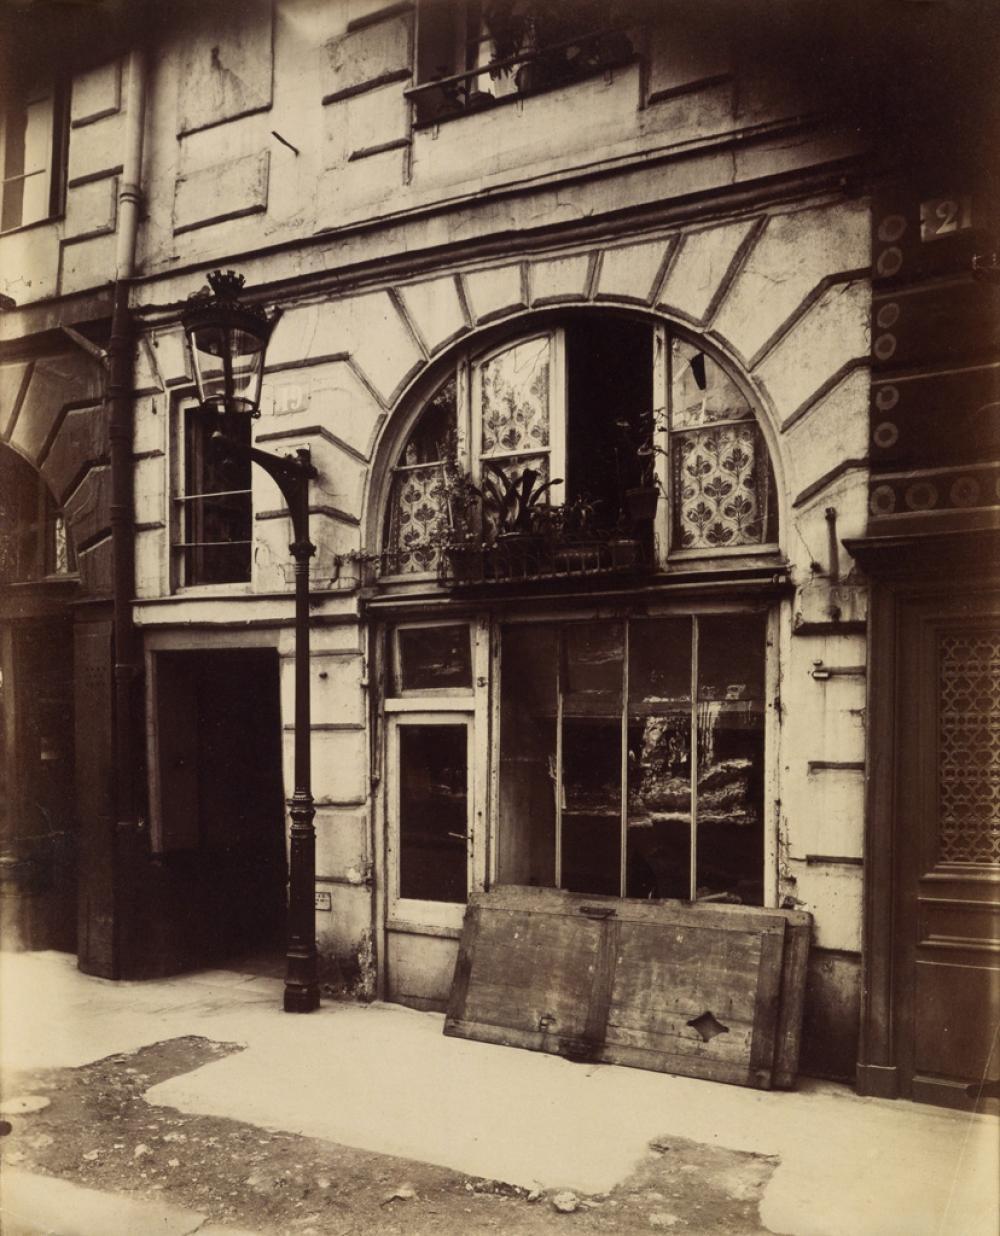 EUGÈNE ATGET (1857-1927) Boutique 19 Place Dauphine.